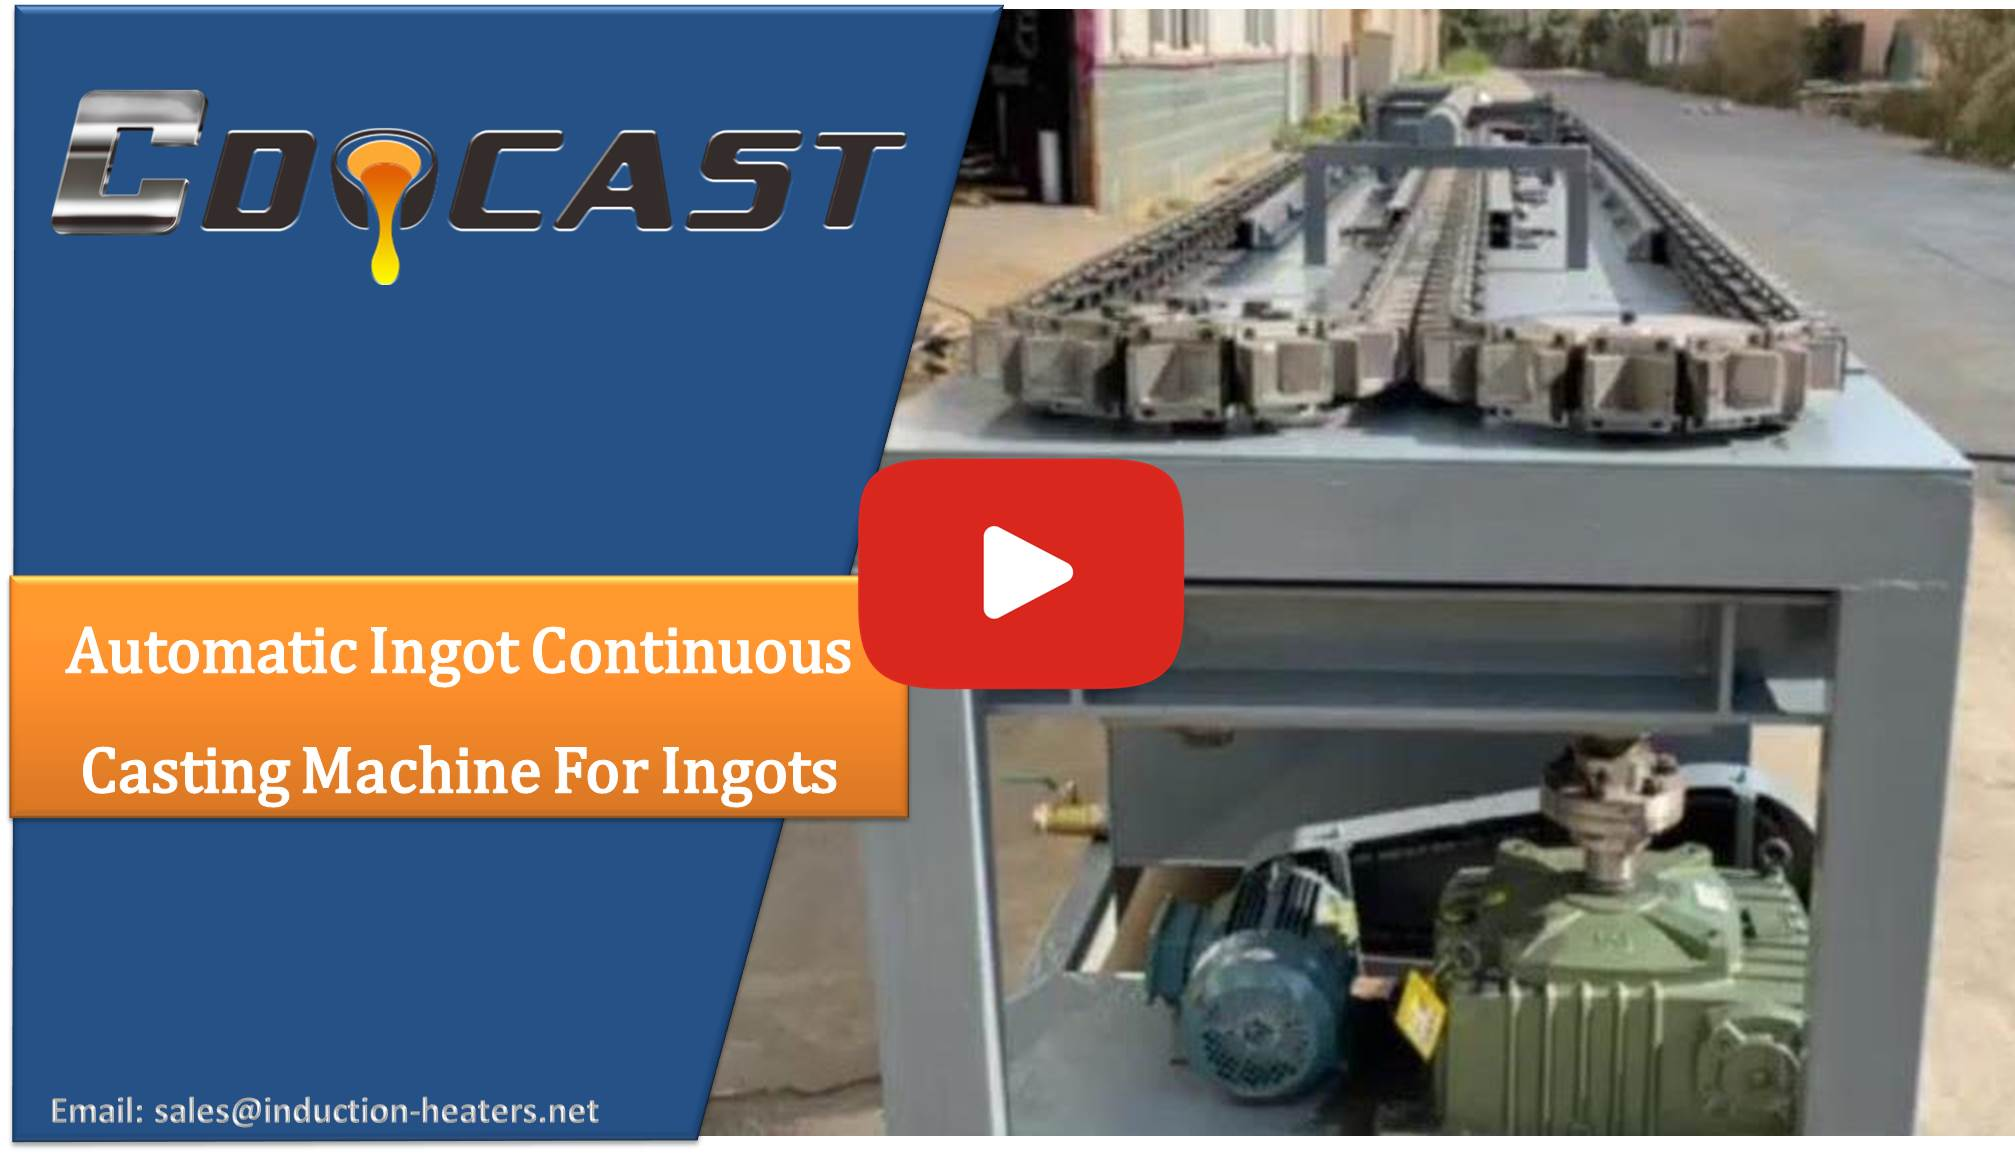 Automatic ingot continuous casting machine for ingots